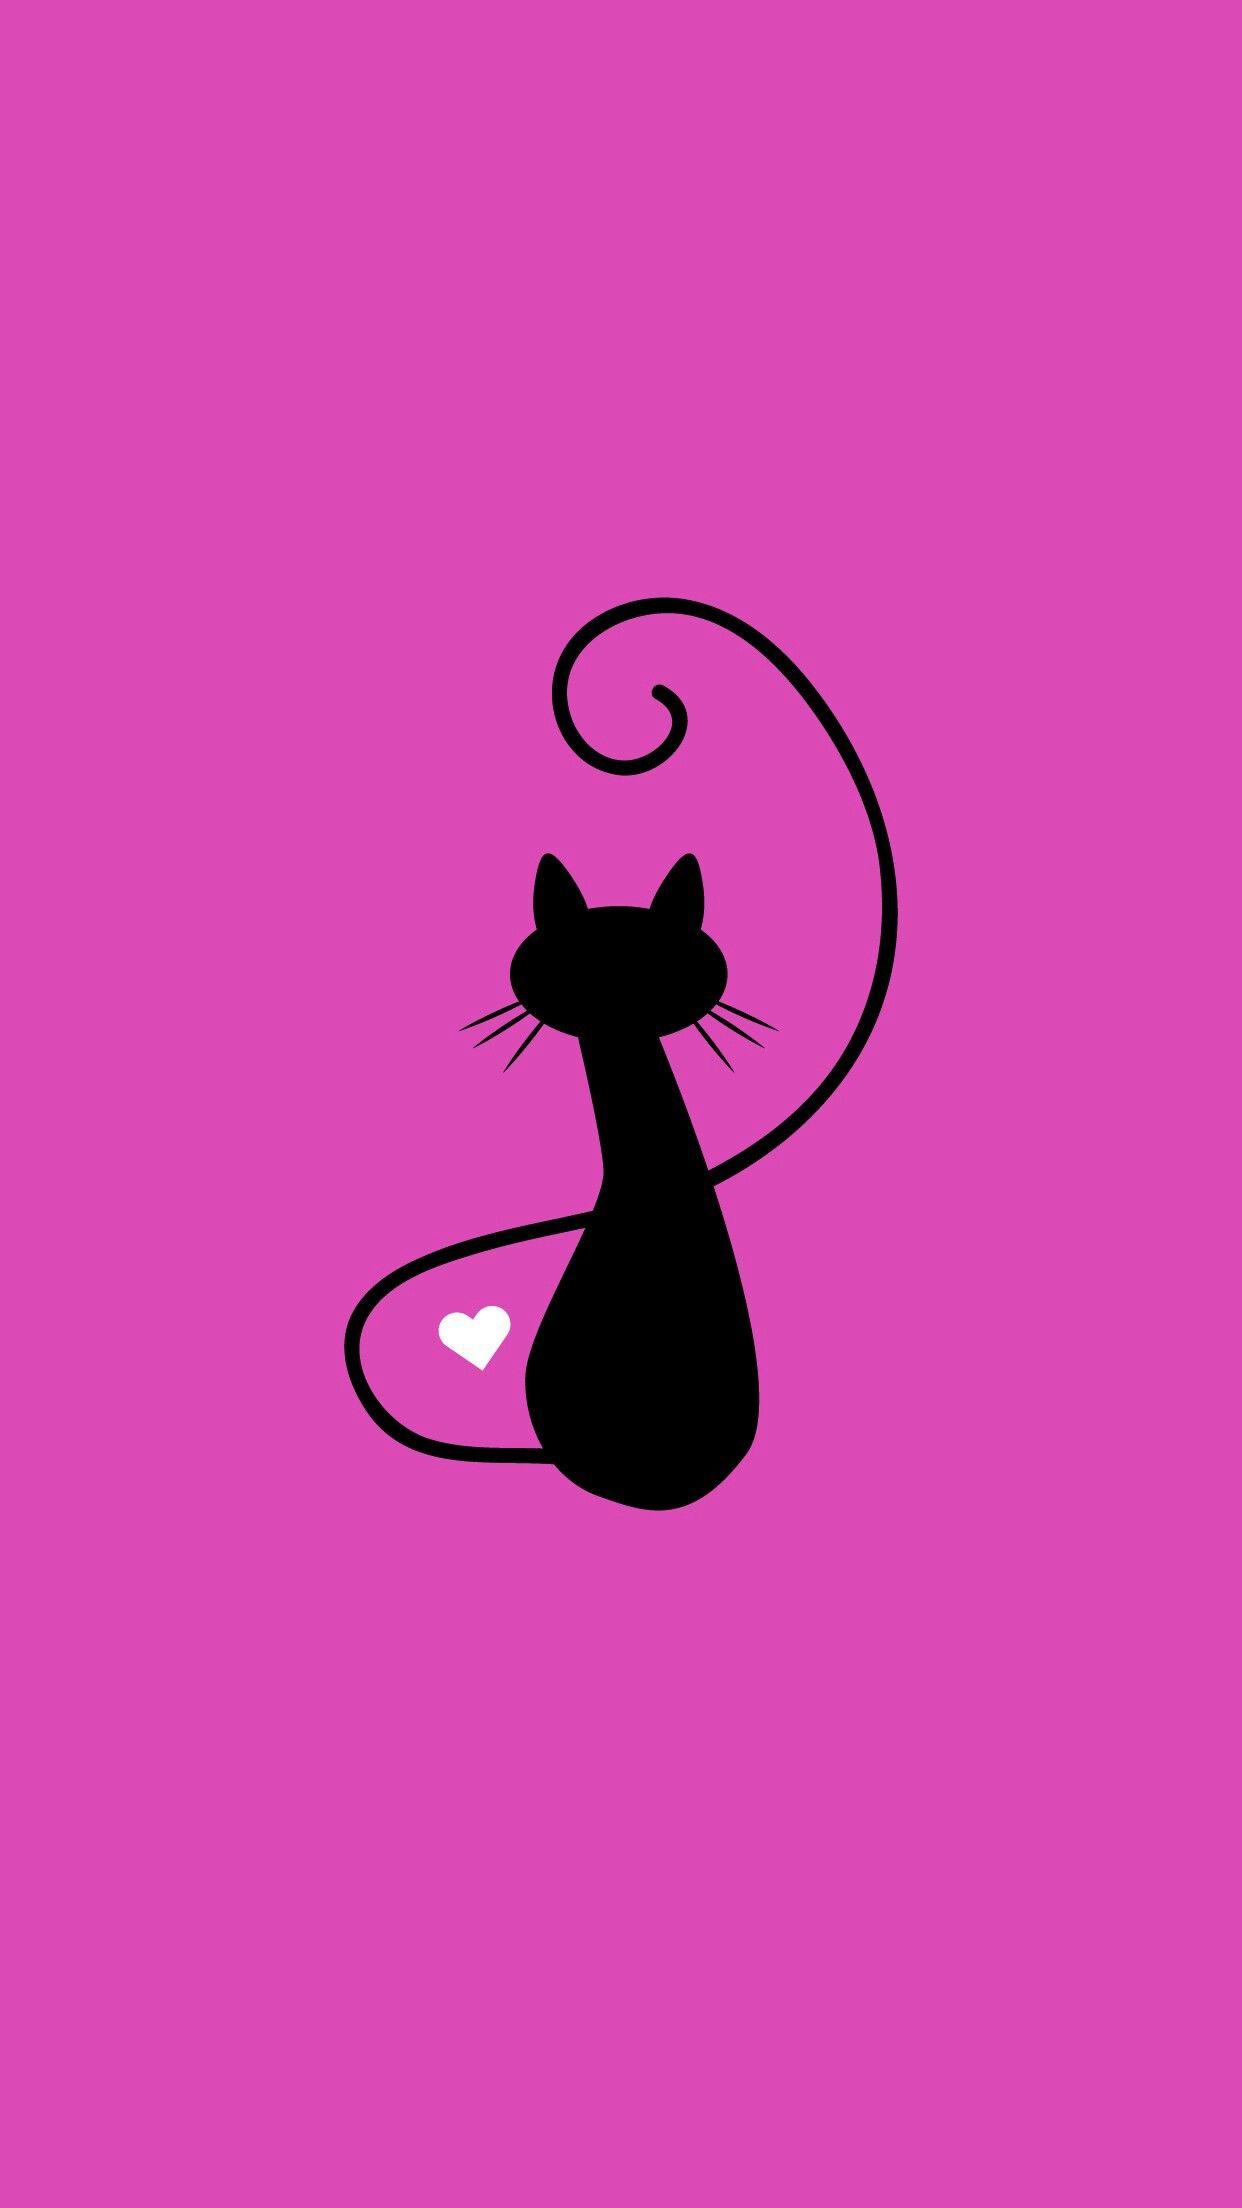 Про успех, картинки с рисованными кошками на телефон